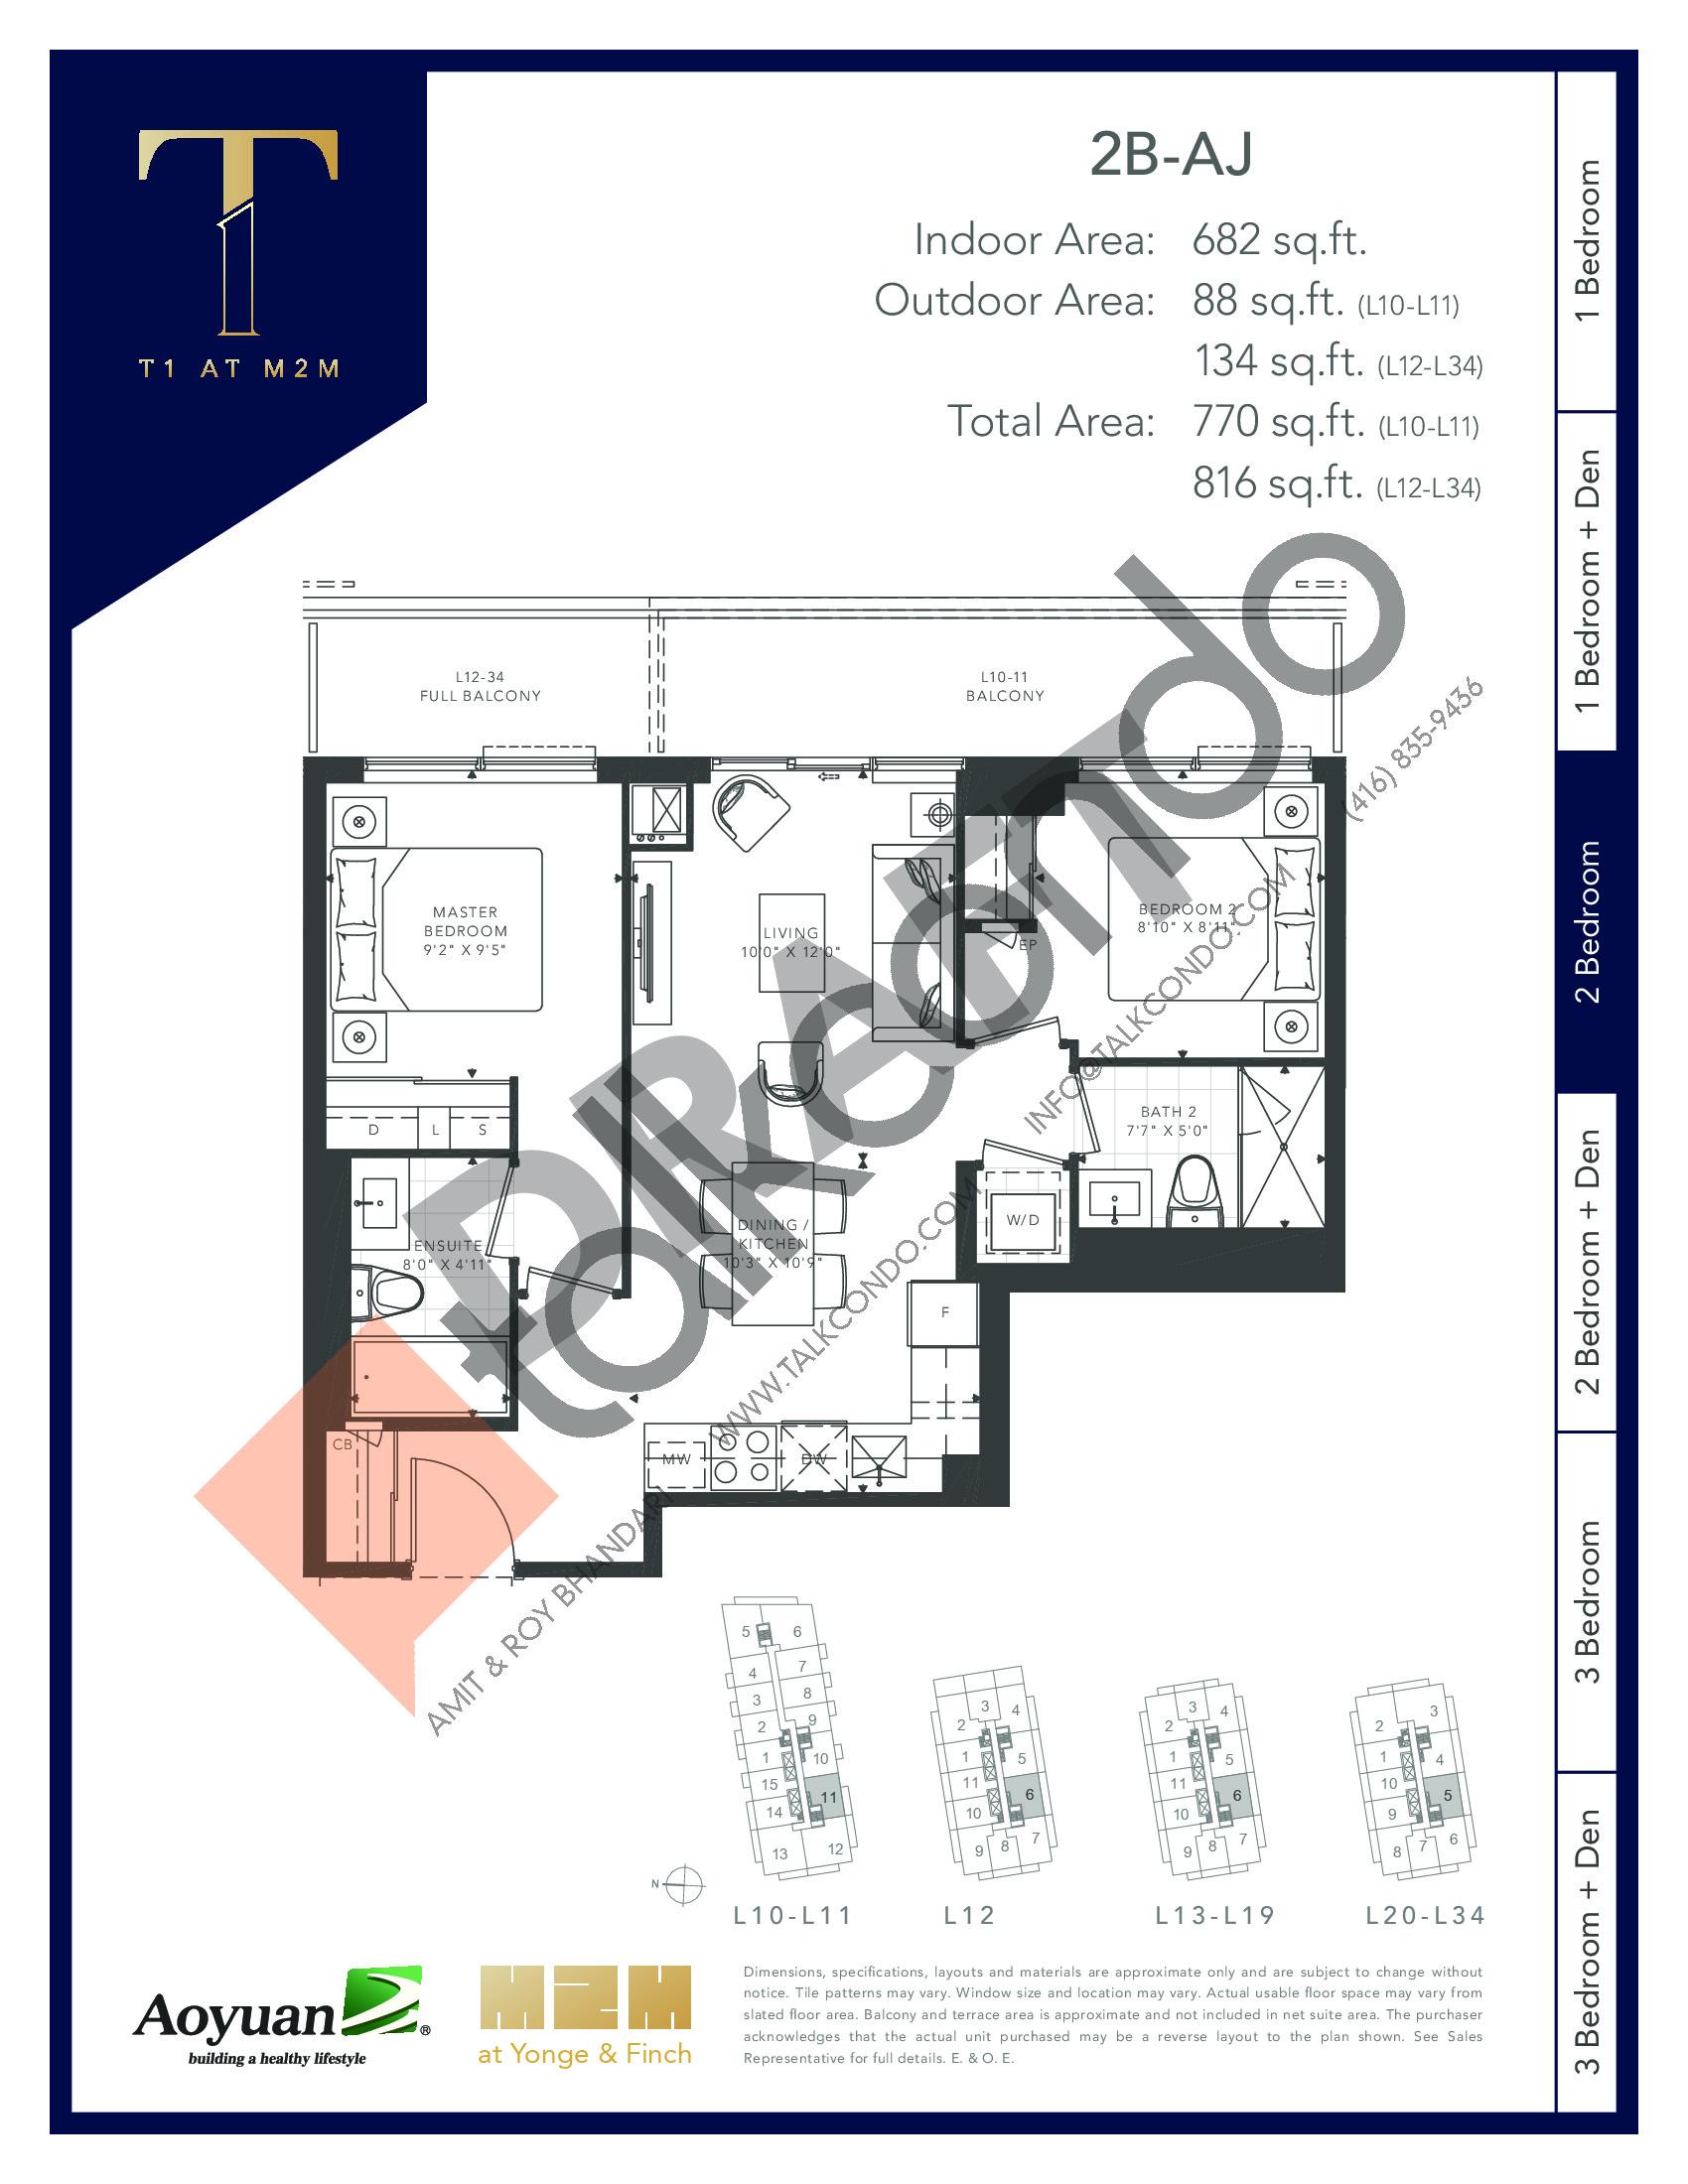 2B-AJ (Tower) Floor Plan at T1 at M2M Condos - 682 sq.ft